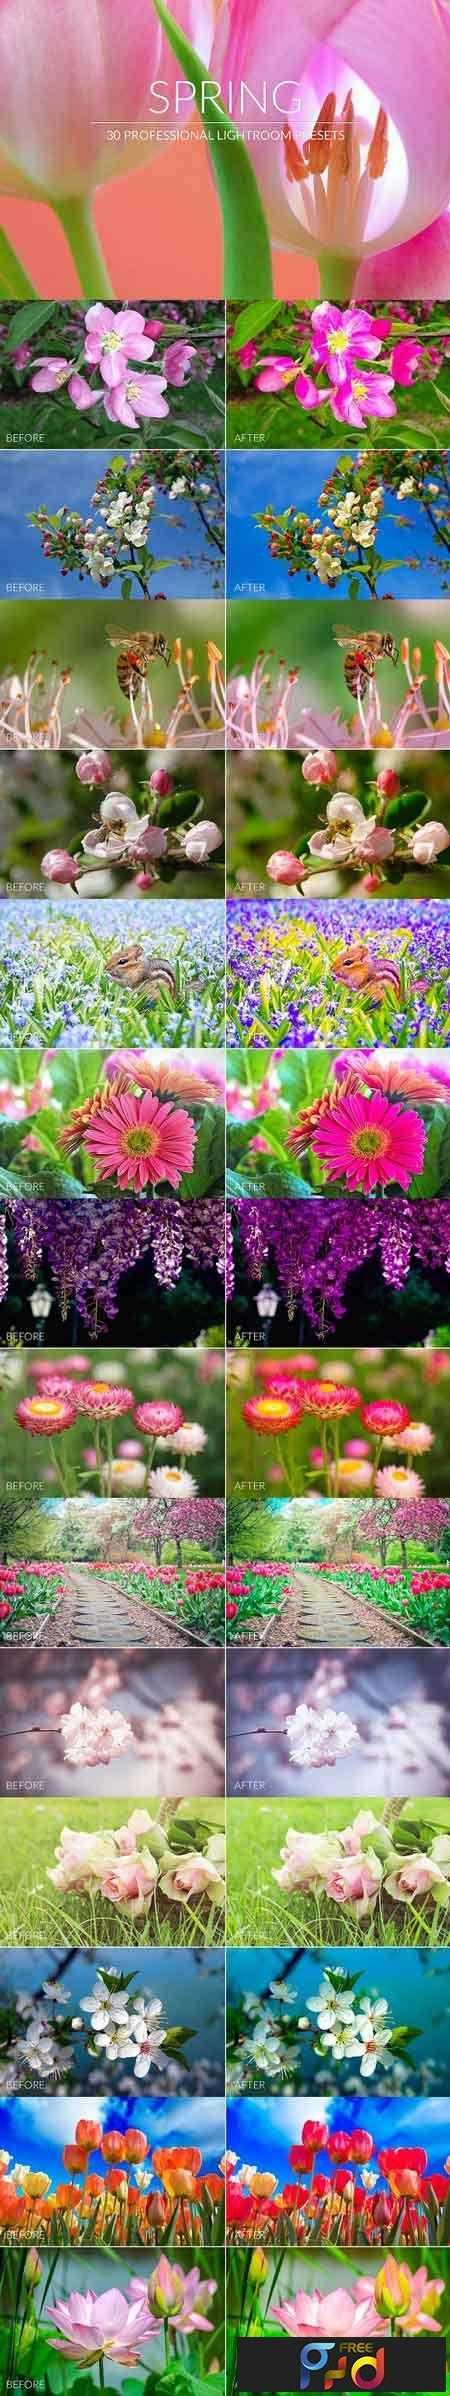 1812302 Spring Lr Presets 2966663 1